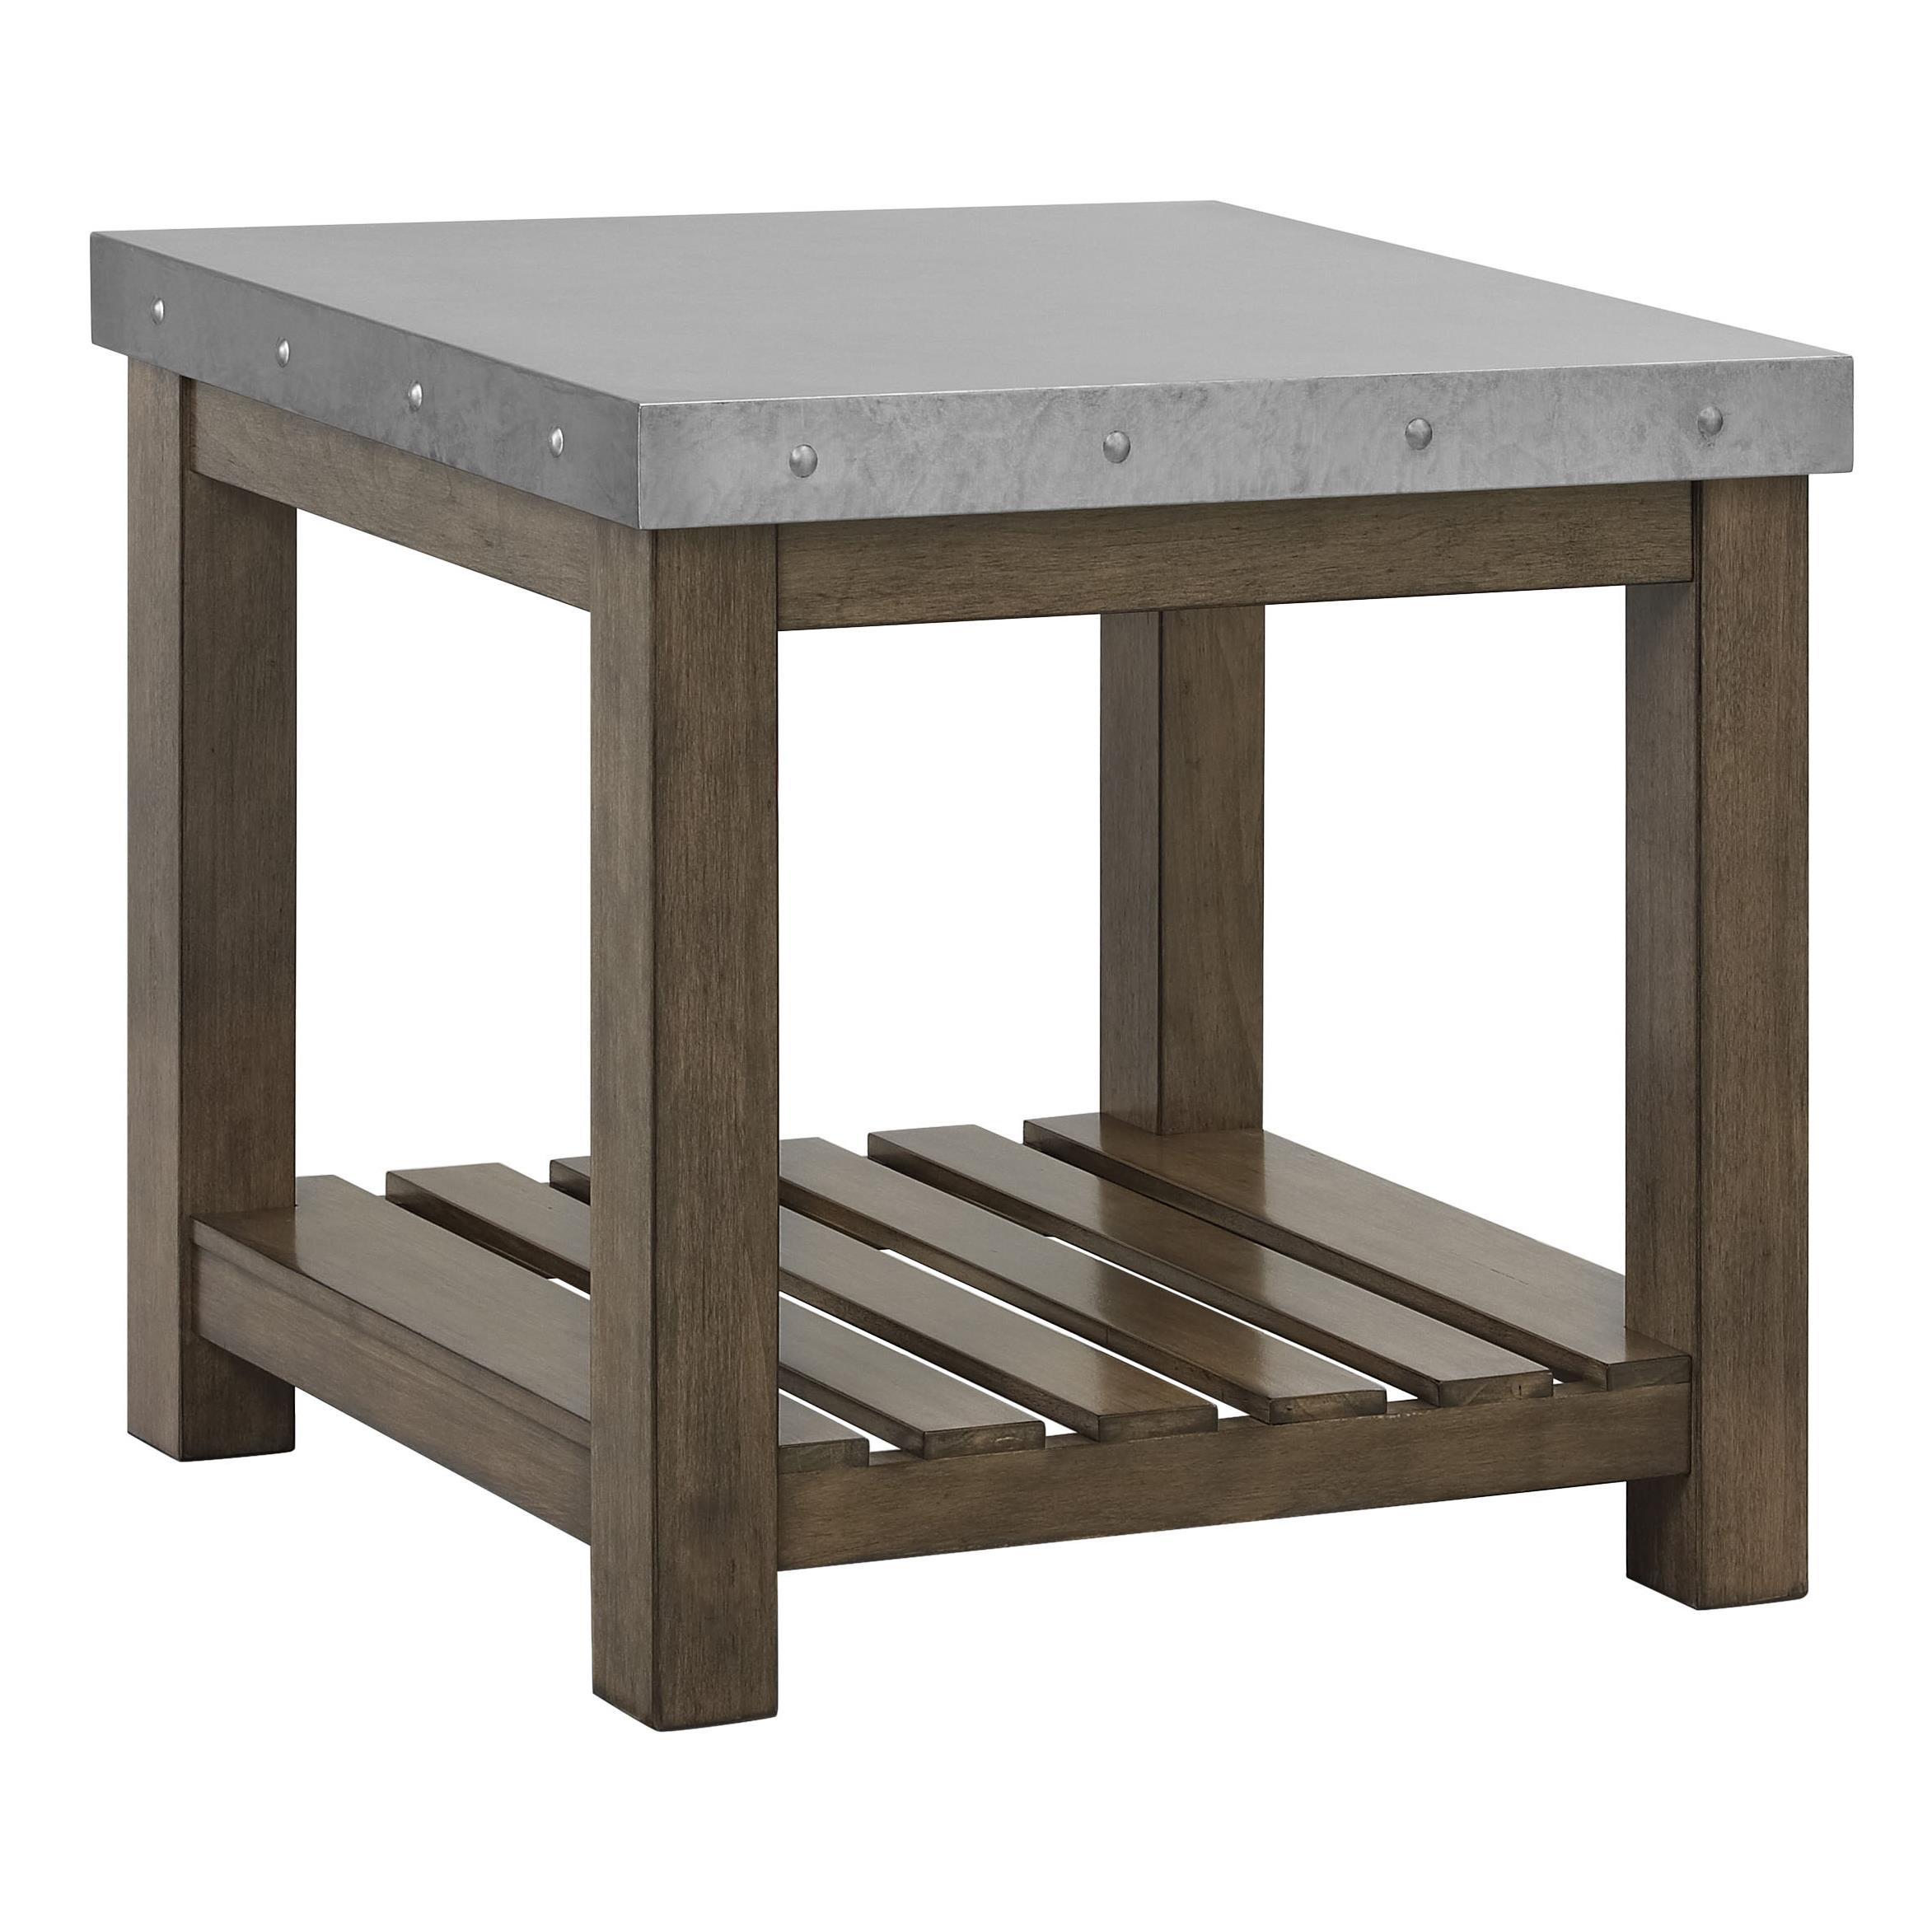 Standard Furniture Riverton Accent Tables End Table - Item Number: 28582